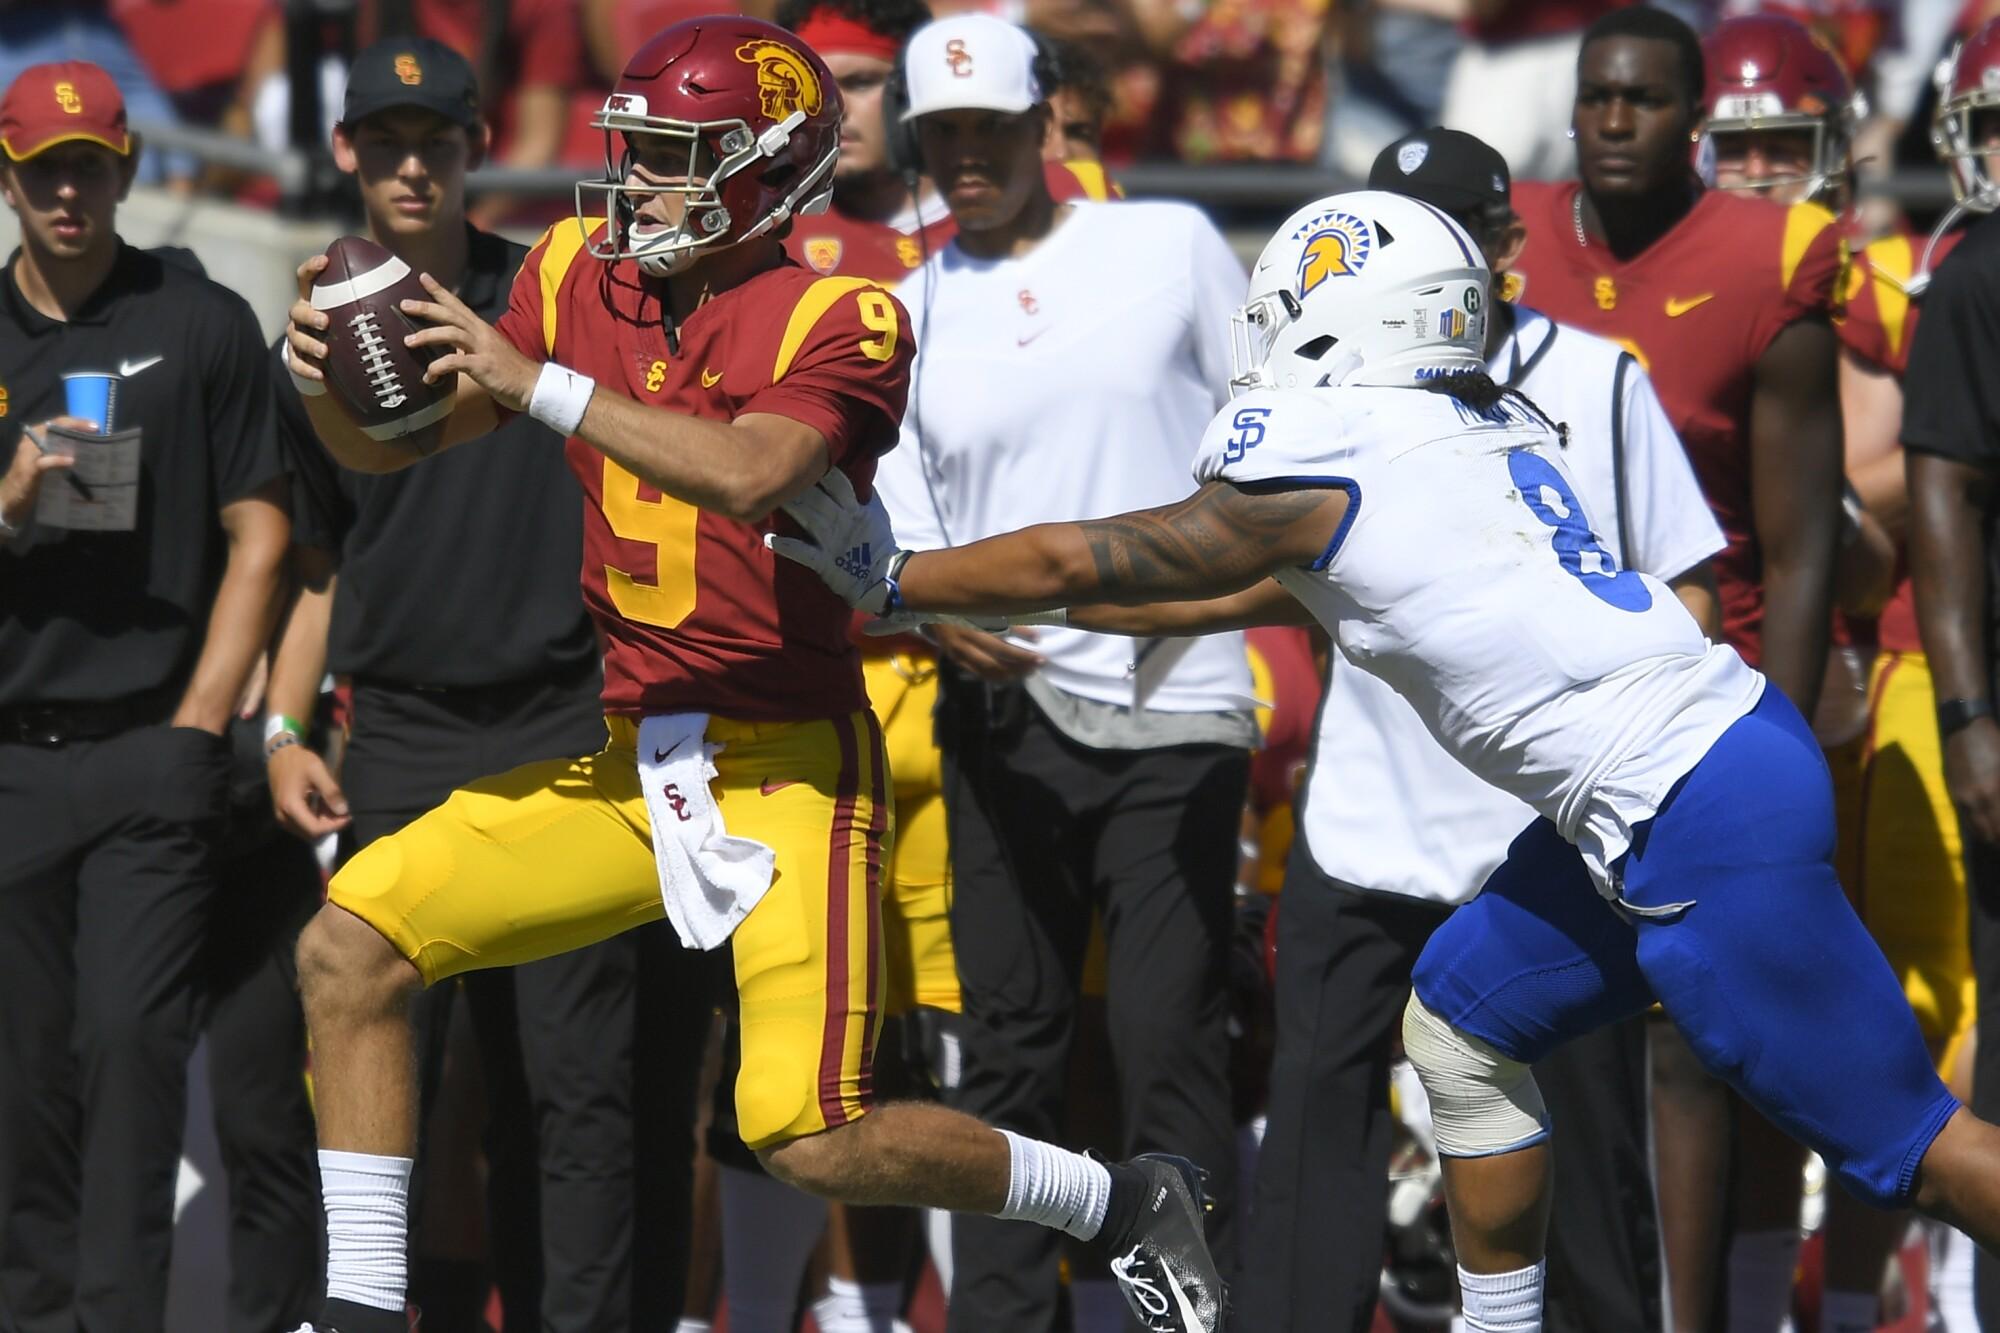 San Jose State linebacker Alii Matau pushes USC quarterback Kedon Slovis out of bounds